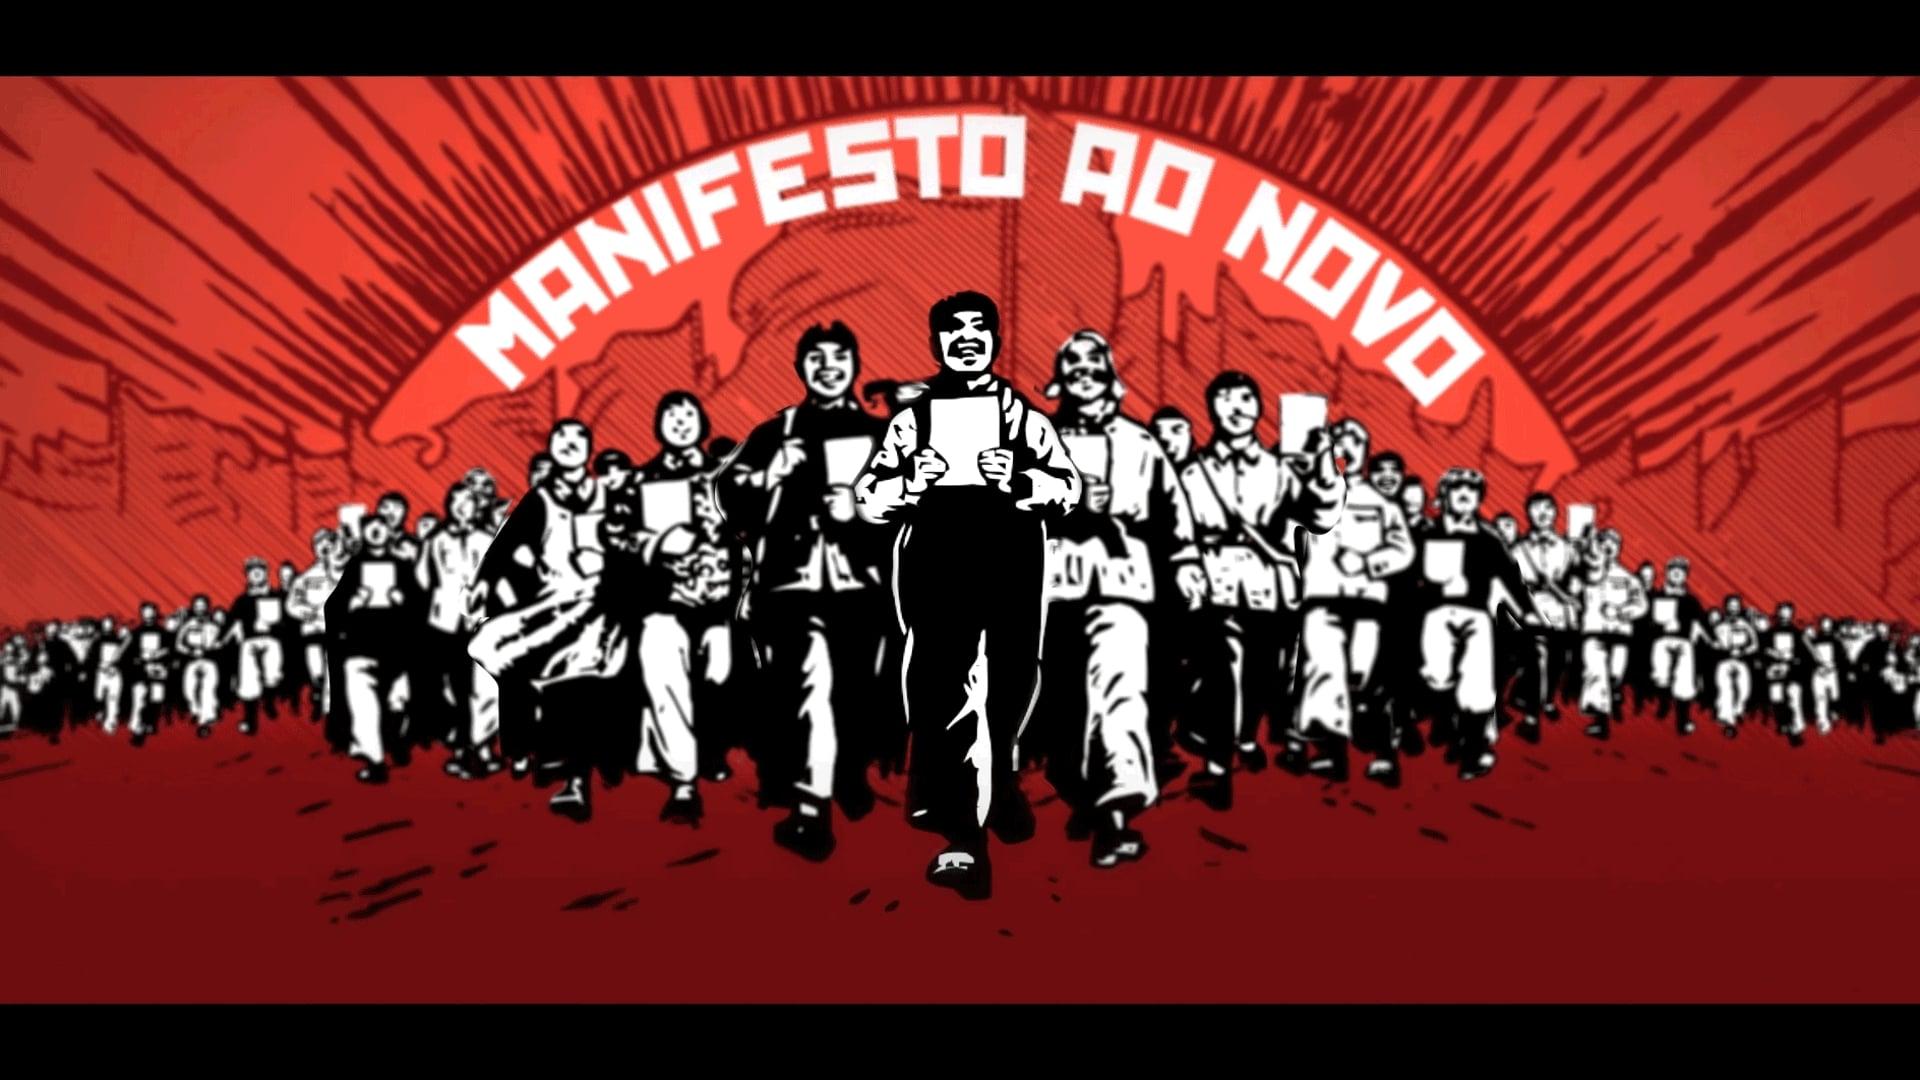 AGÊNCIA ÚNICA - Manifesto ao Novo